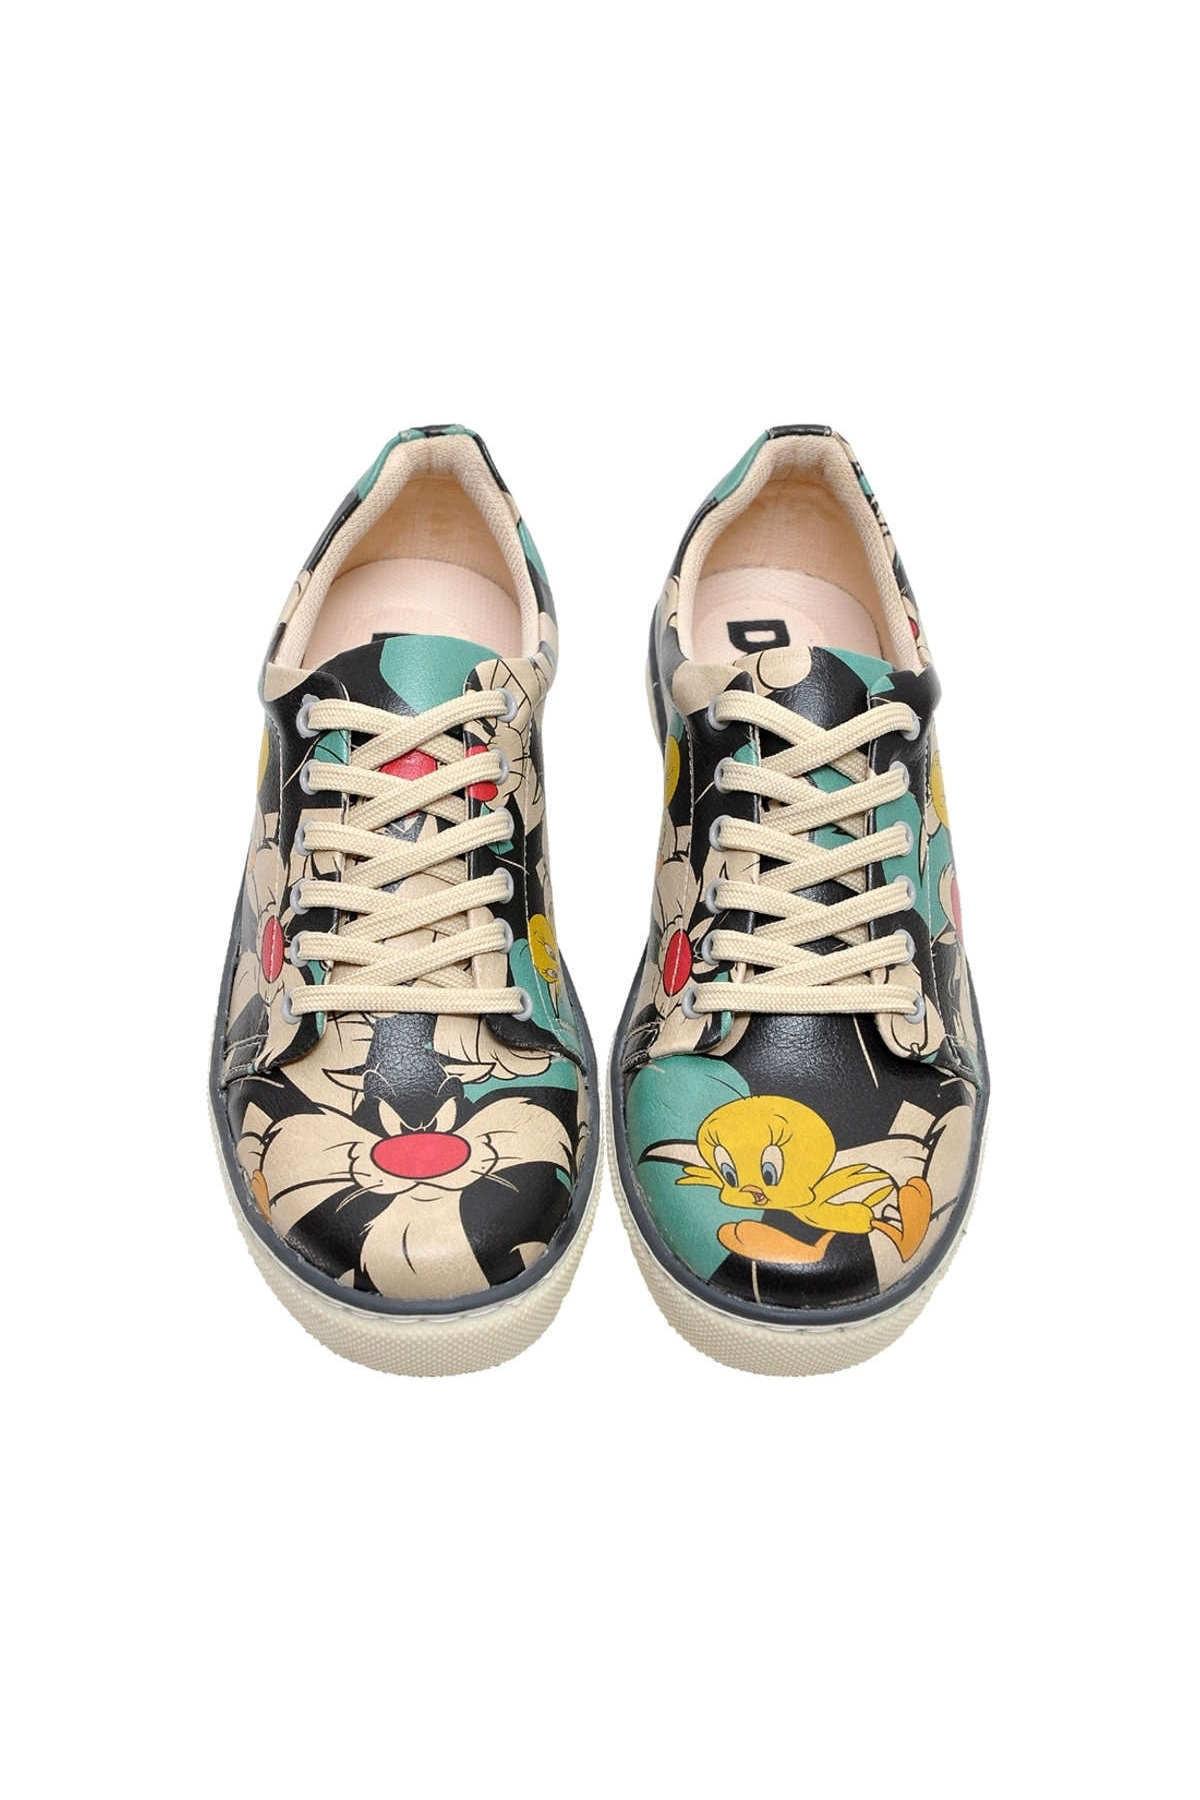 Dogo Catch Me If You Can Tweety / Sneakers Kadin Ayakkabi 2